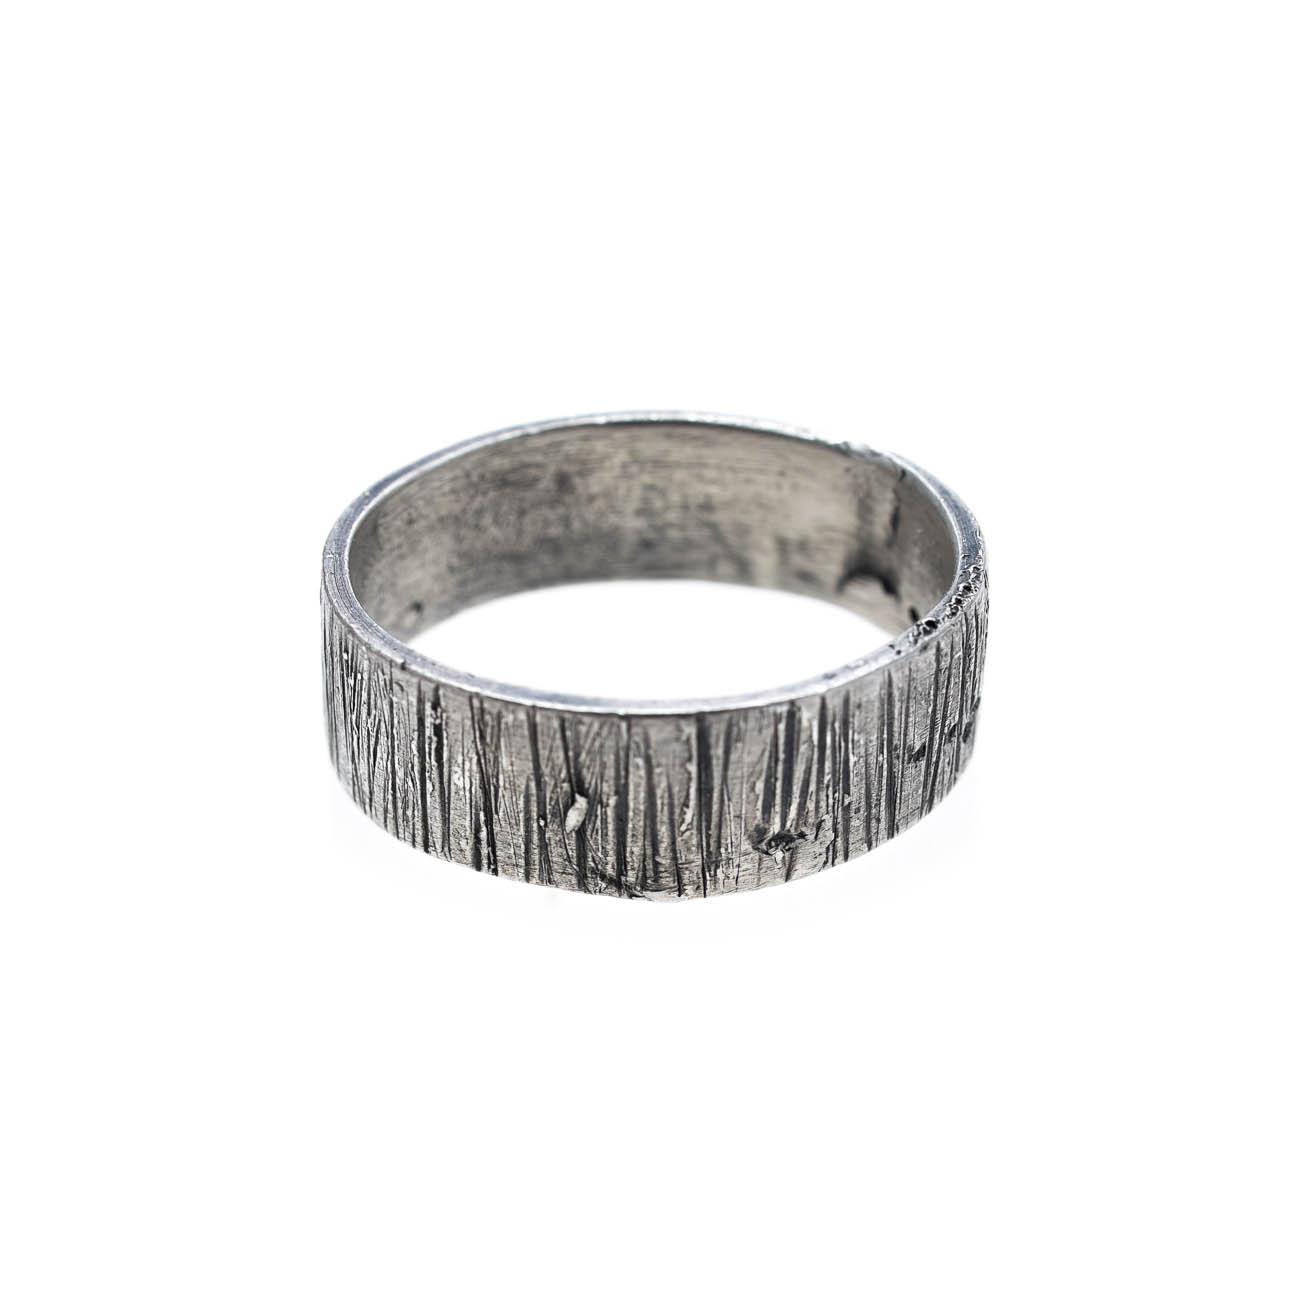 Sterling silver ring by Katerina Glinou